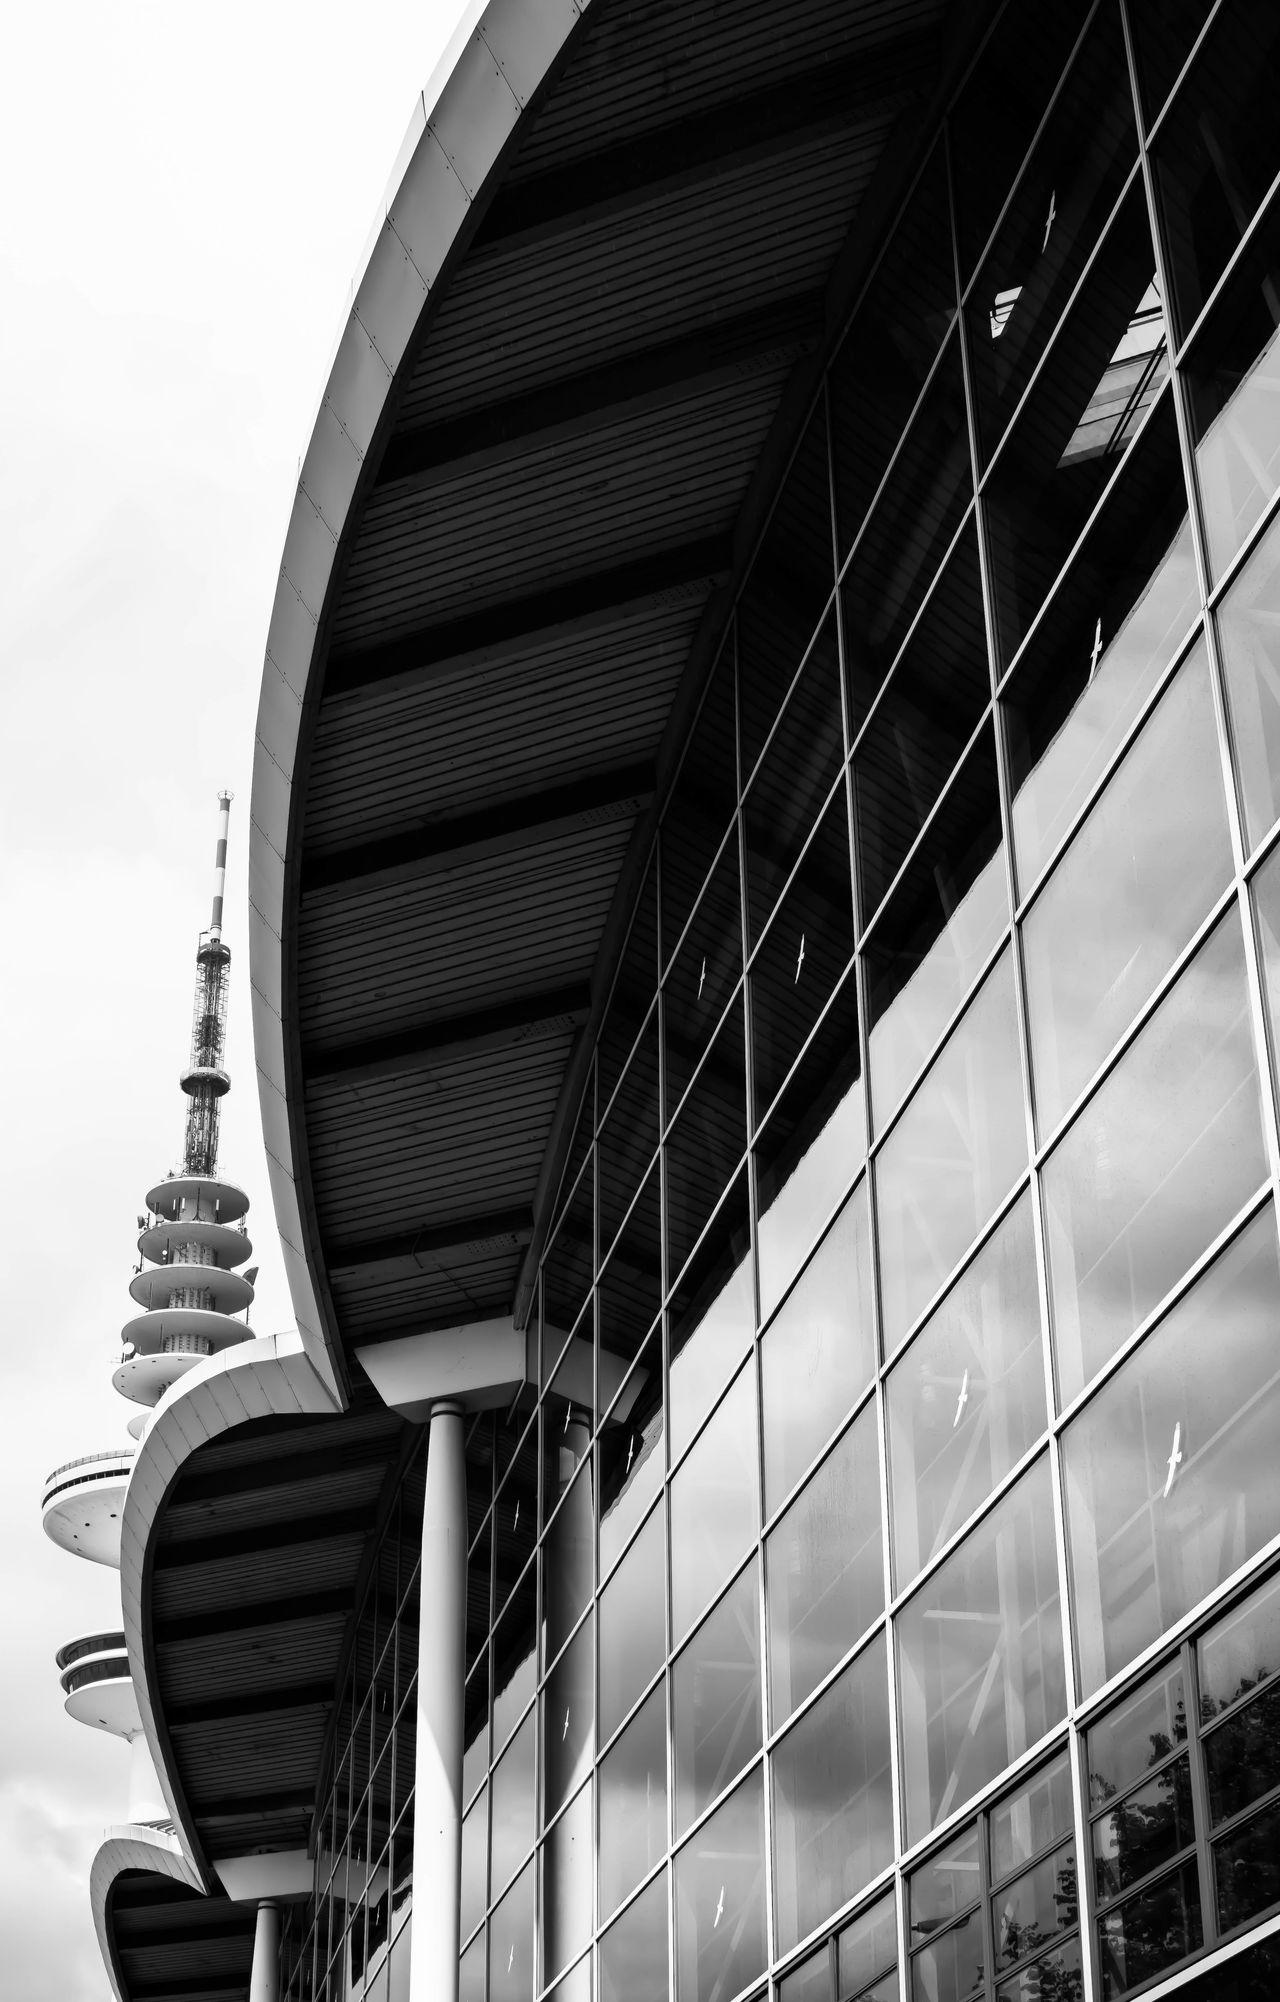 scapesshapes... Architecture Architecture_bw Blackandwhite Cityscapes Exhibitionhall Exibition Hall Eye4black&white  EyeEm Best Shots - Black + White Fortheloveofblackandwhite Geometric Shapes Hamburg Hamburg Streetphotography Light And Shadow Messehallen Modern Architecture Monochrome Open Edit Round Schwarzweiß Taking Photos Telemichel Tower TV Tower Urban Geometry Urbanphotography